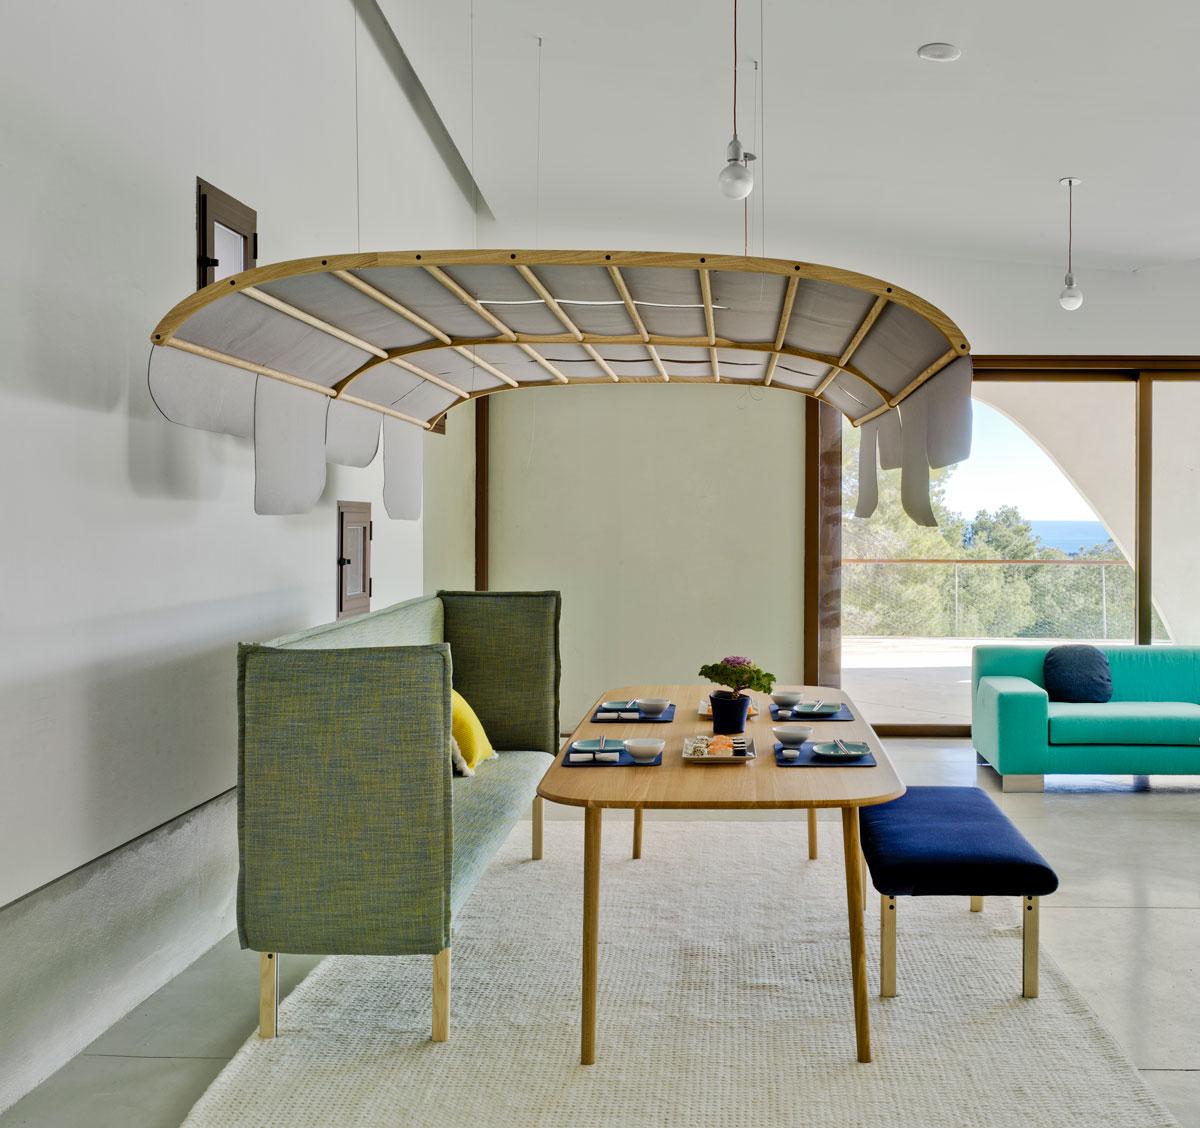 Tartana contemporánea que sirve como cúpula acústica. Imagen y diseño de SANCAL